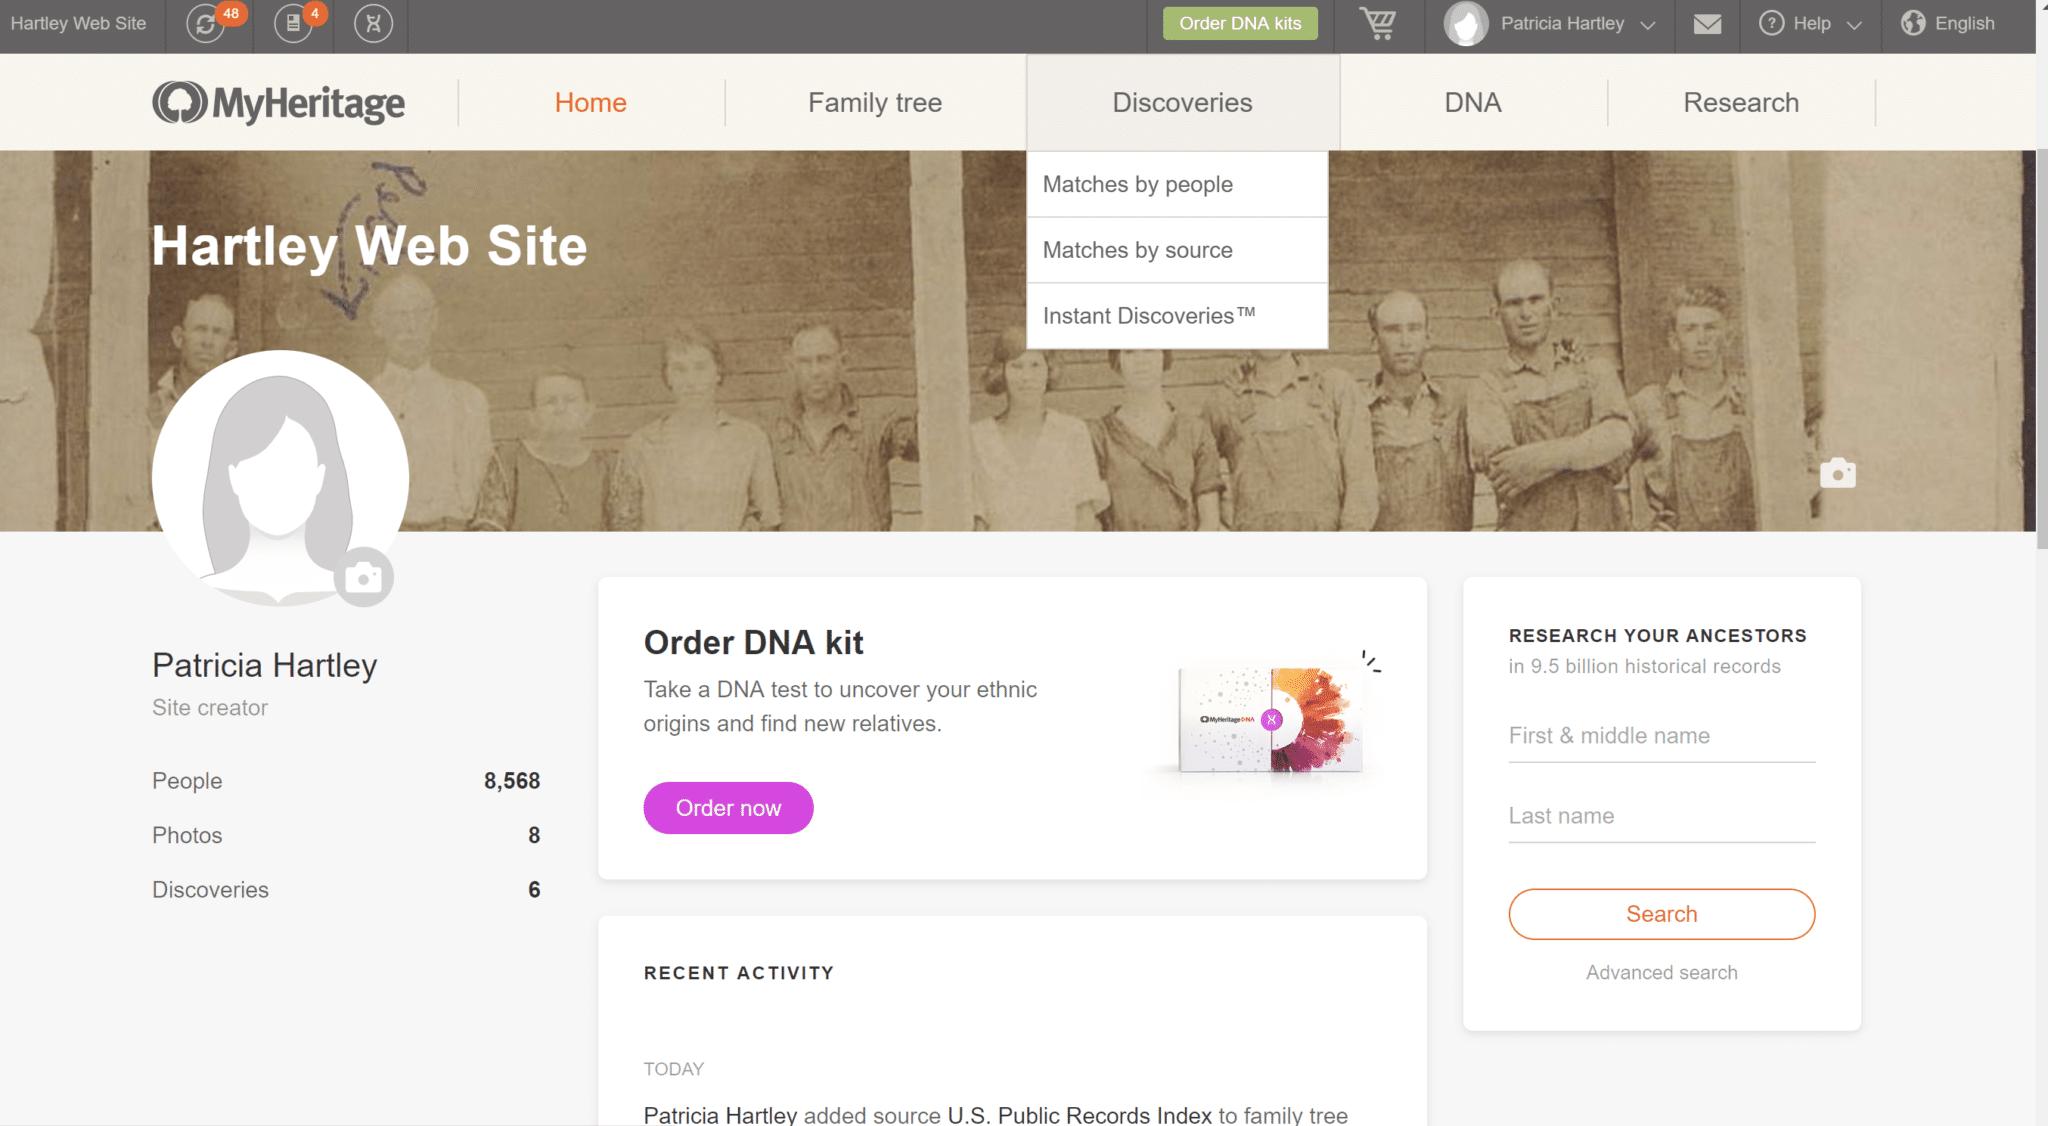 MyHeritage Discoveries Menu